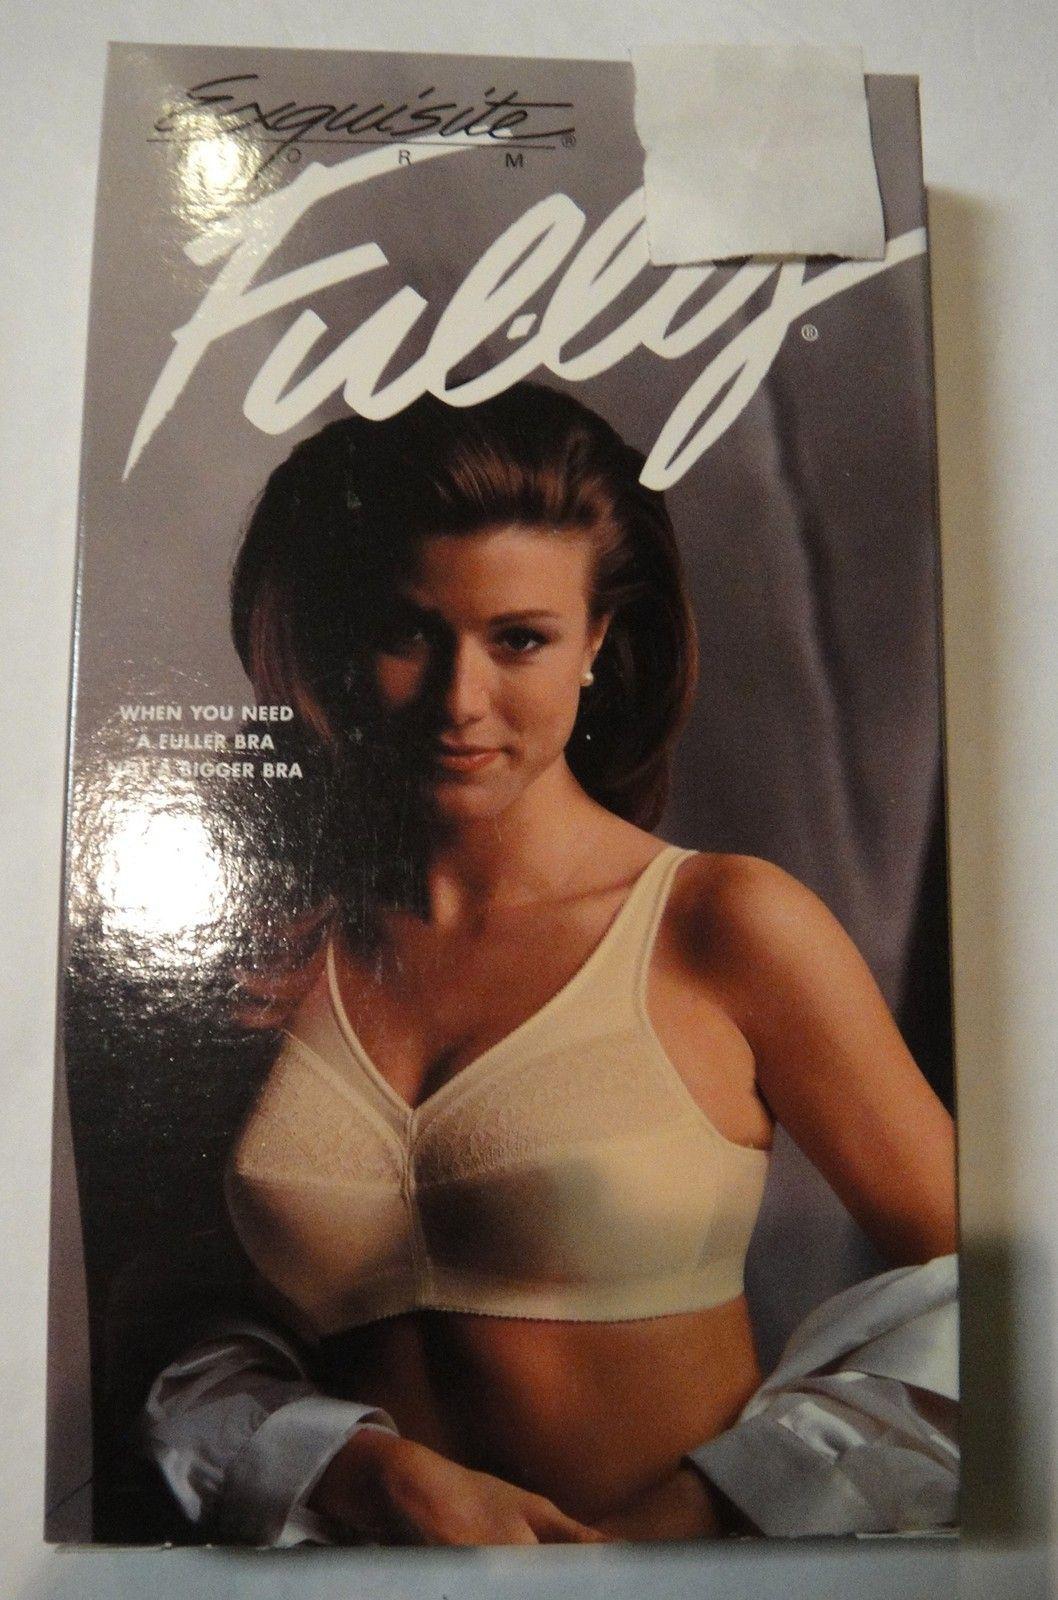 EXQUISITE FORM FULLY Vintage bra Style # 584 BEIGE 36C | eBay ...